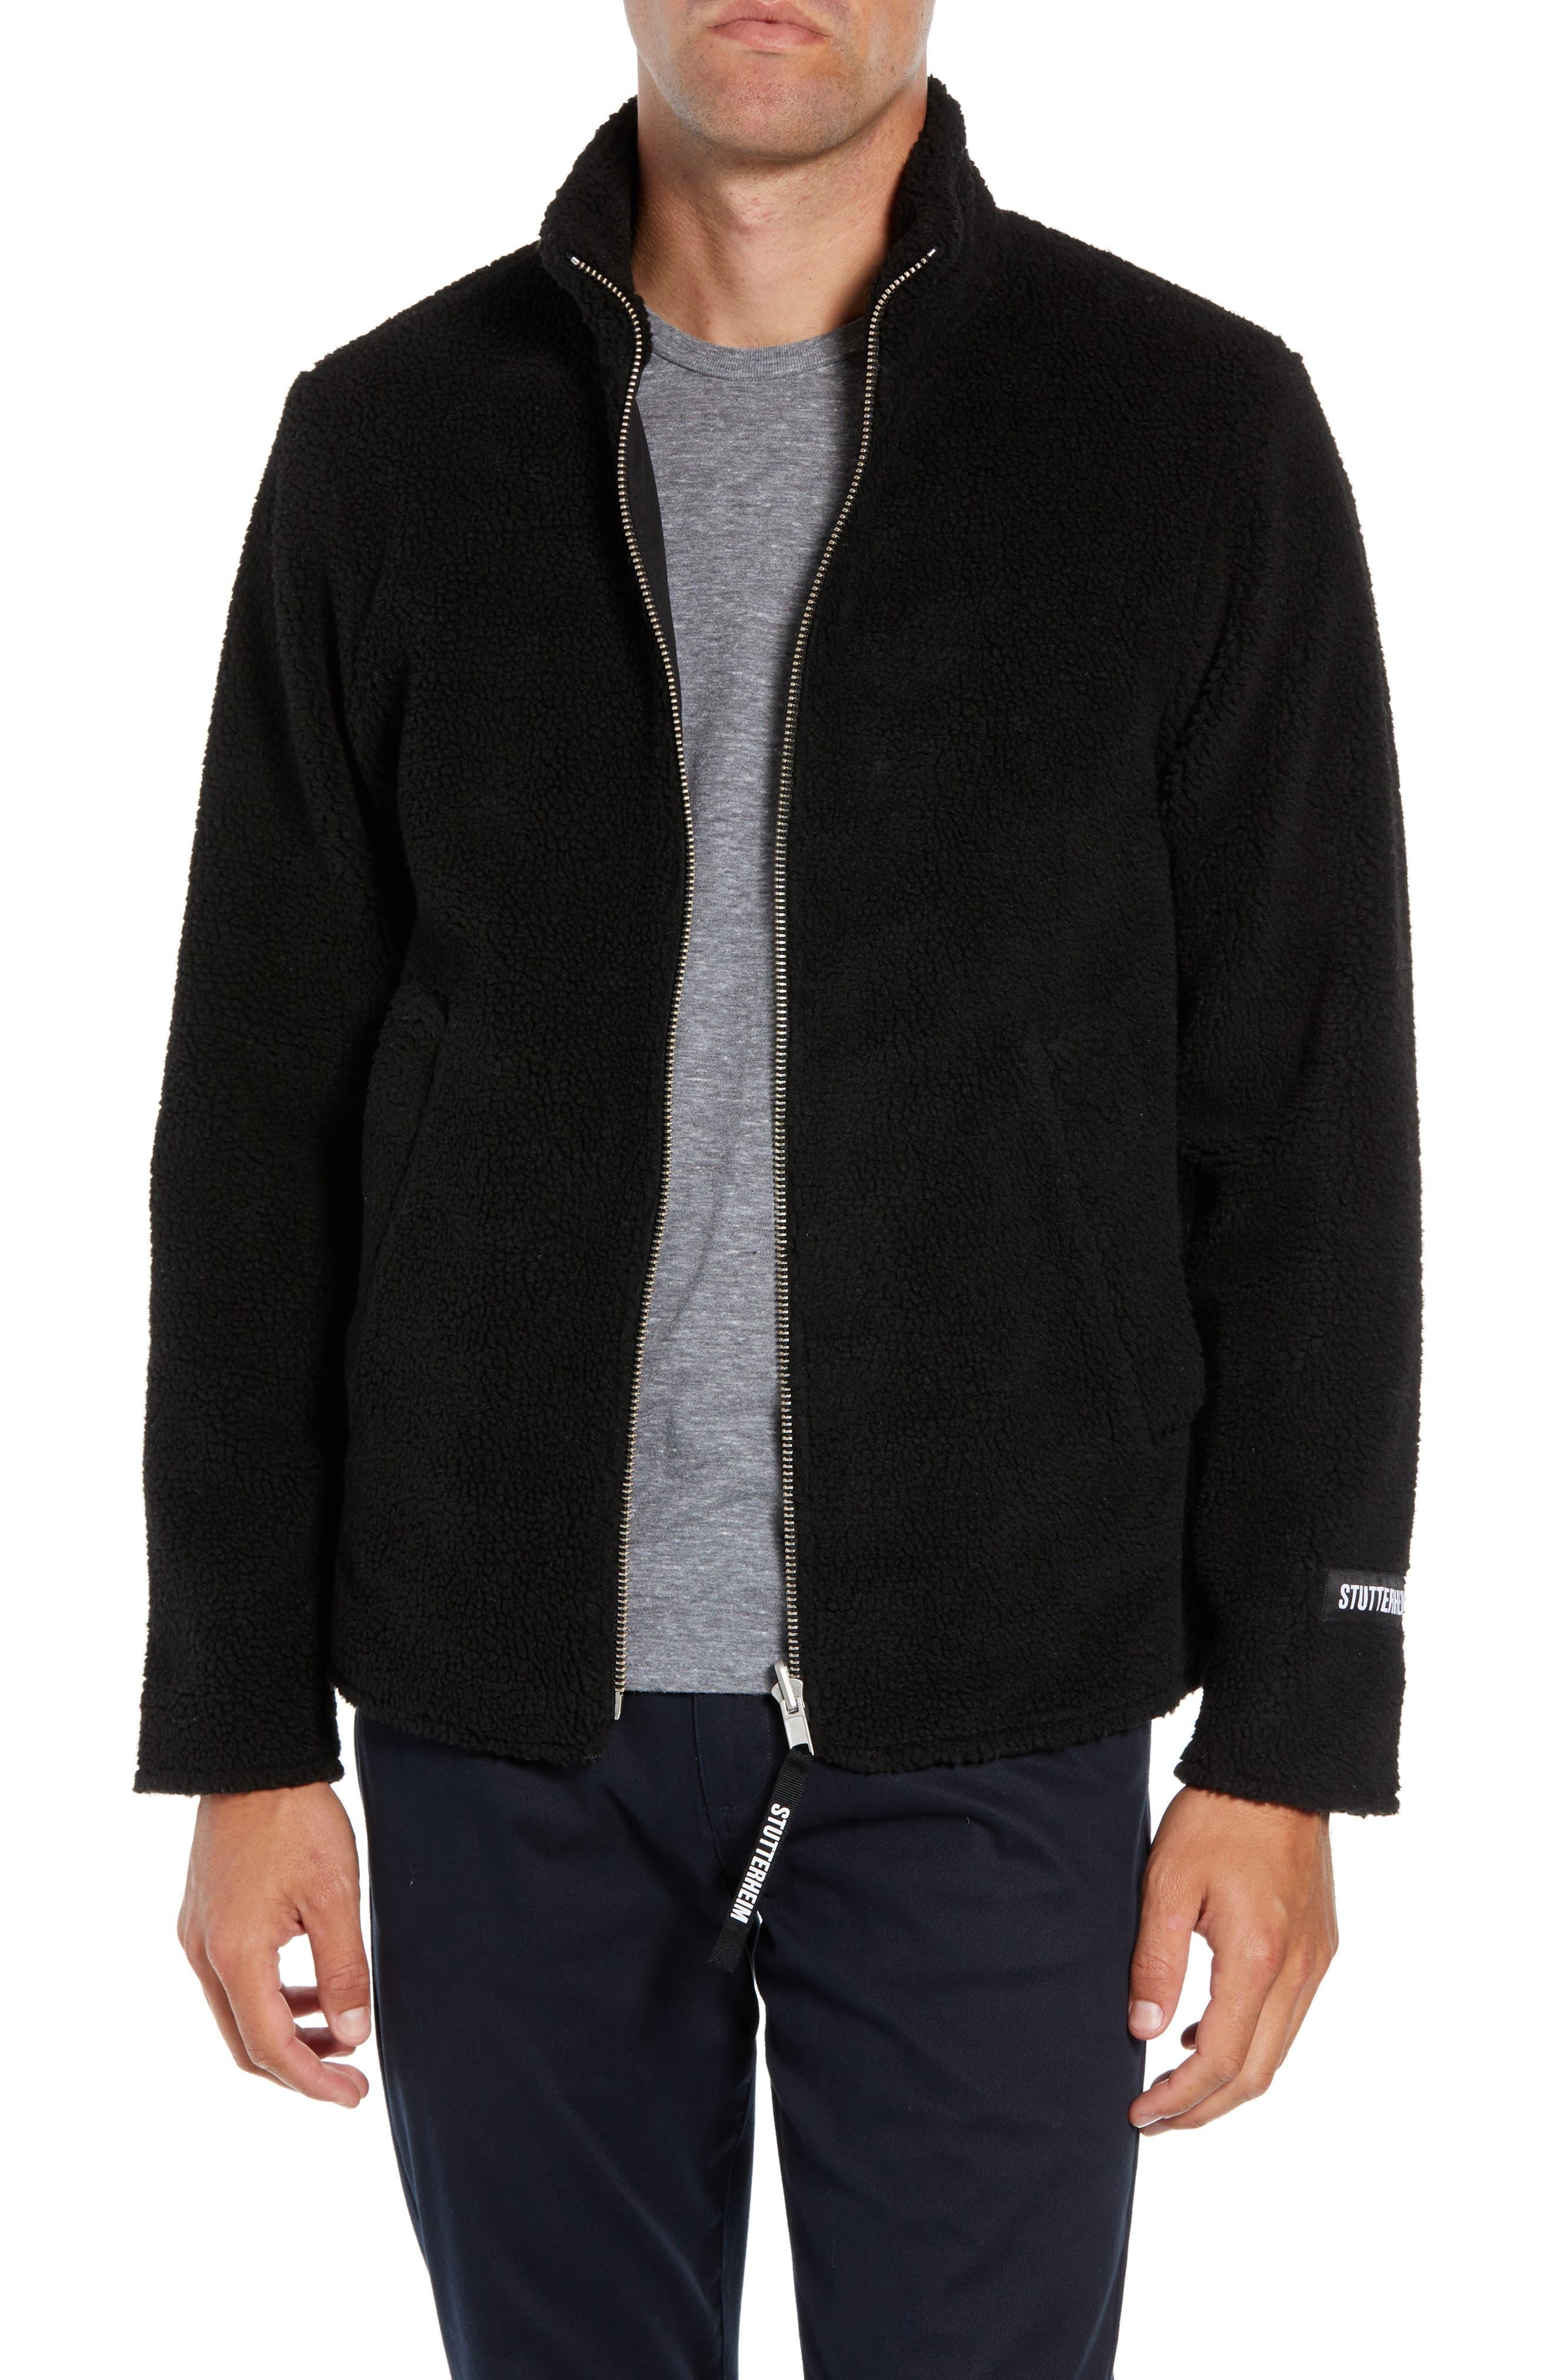 Stutterheim Varby Reversible Fleece Jacket, Black